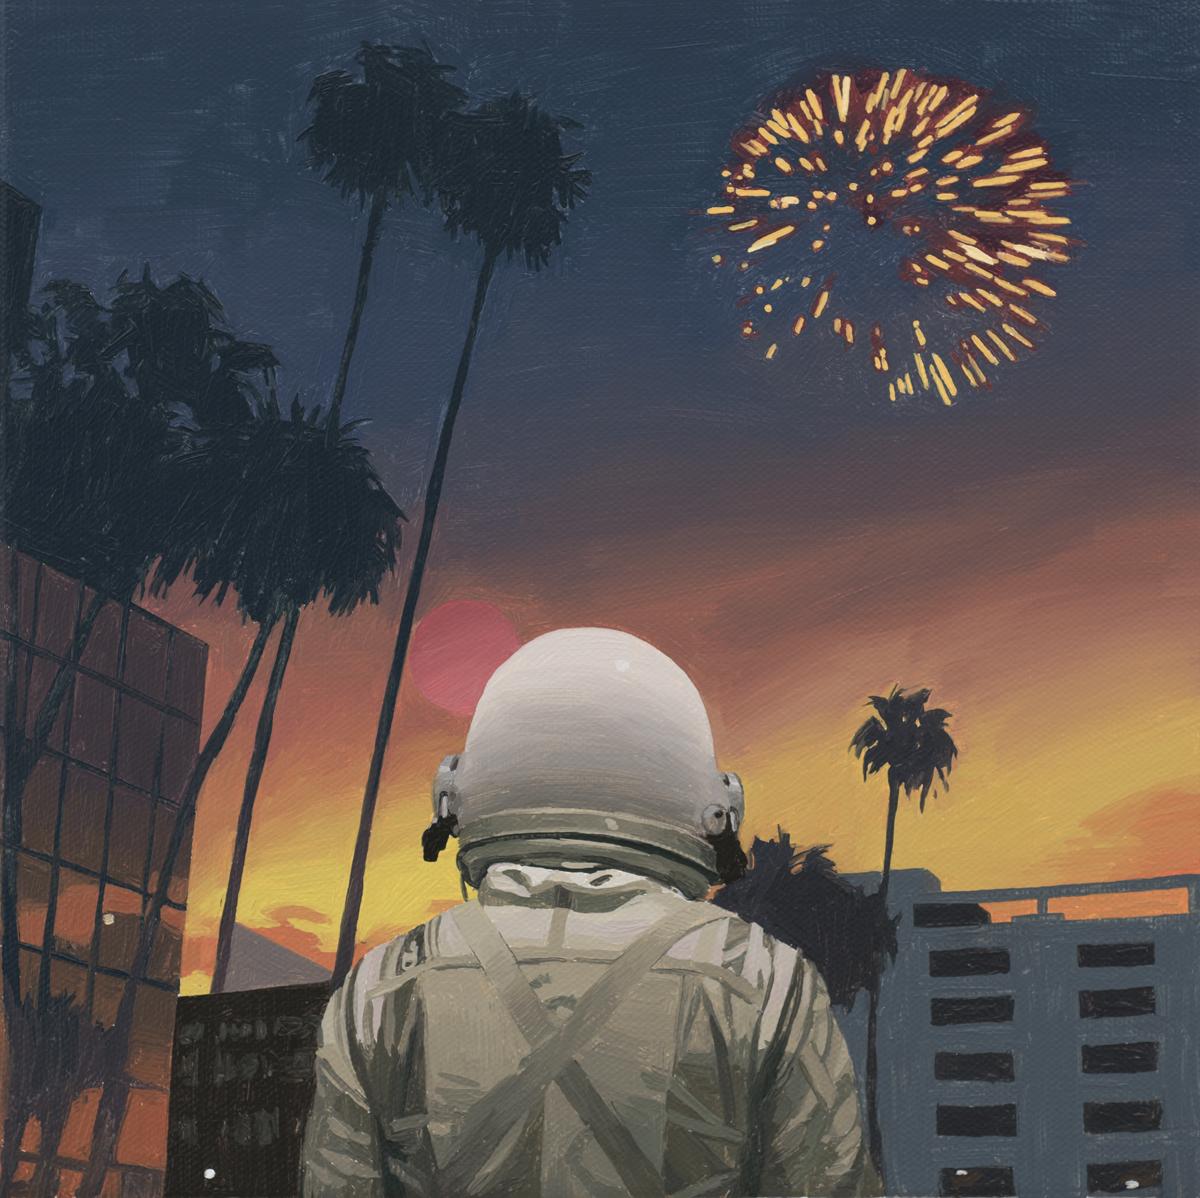 City Fireworks